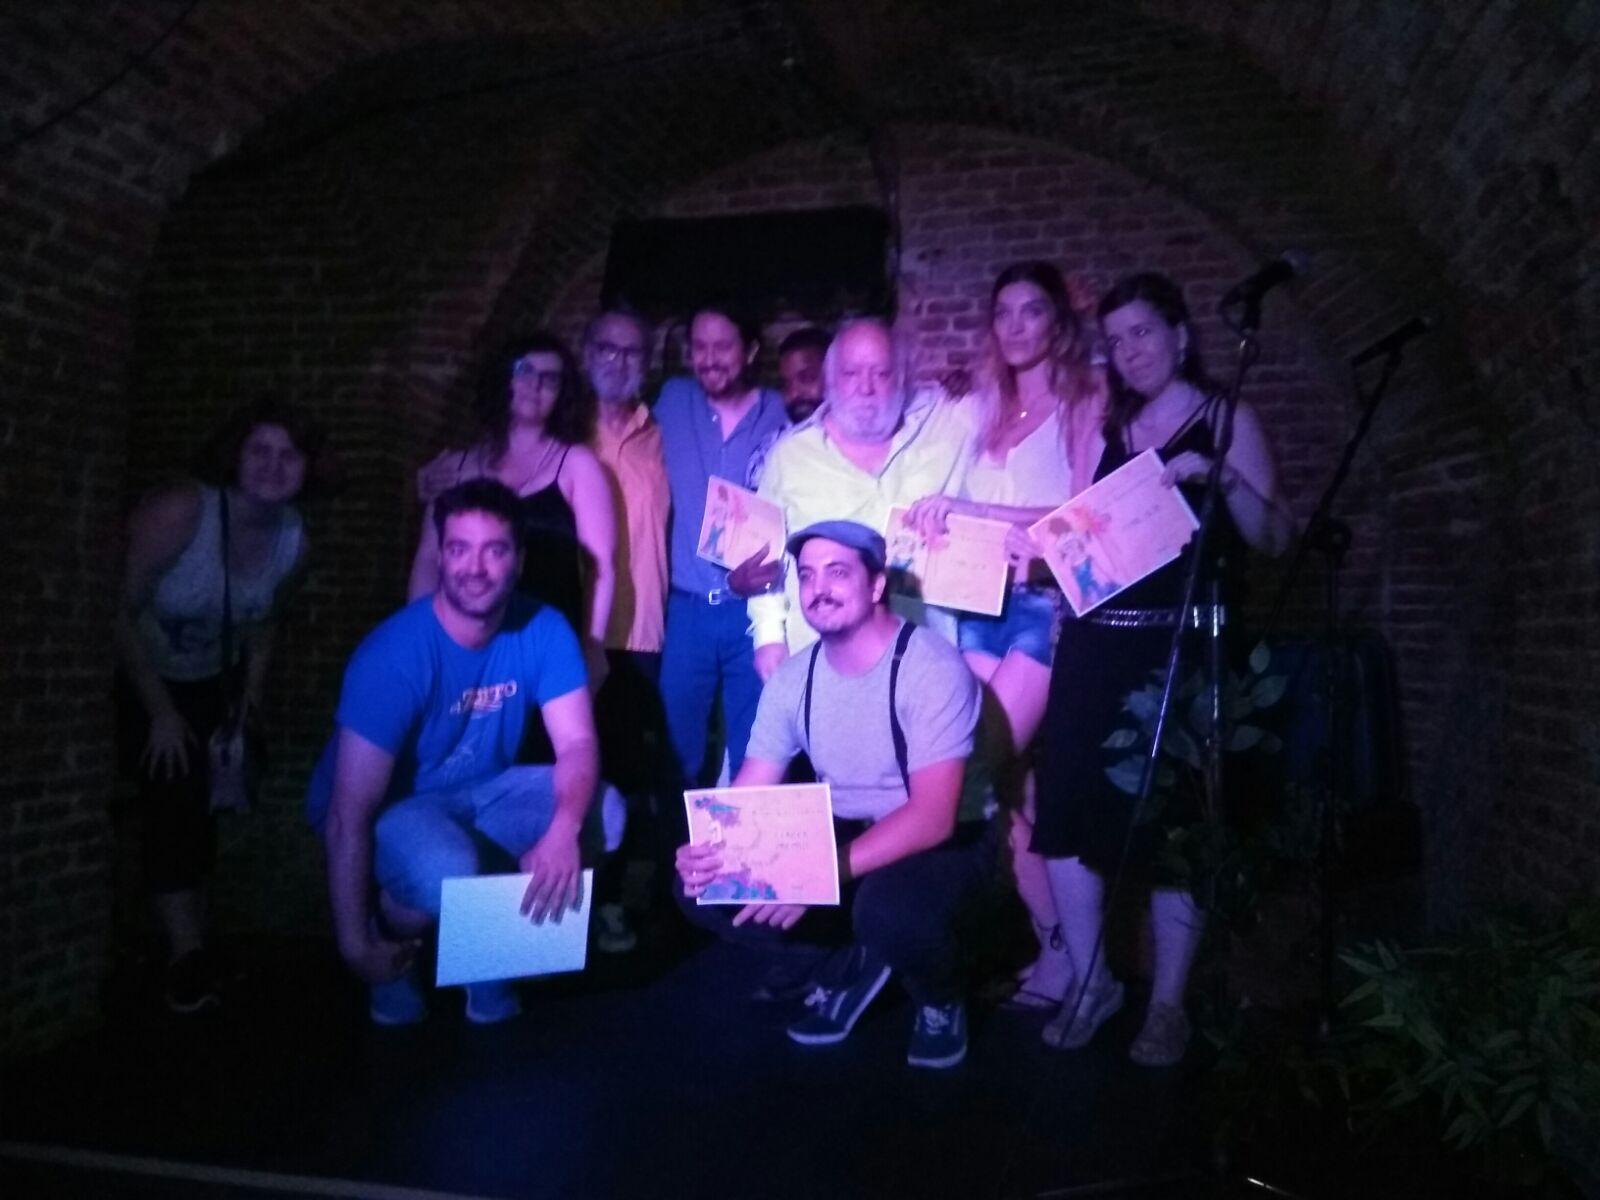 clausura-del-primer-festival-teatro-novel-poesia-directo